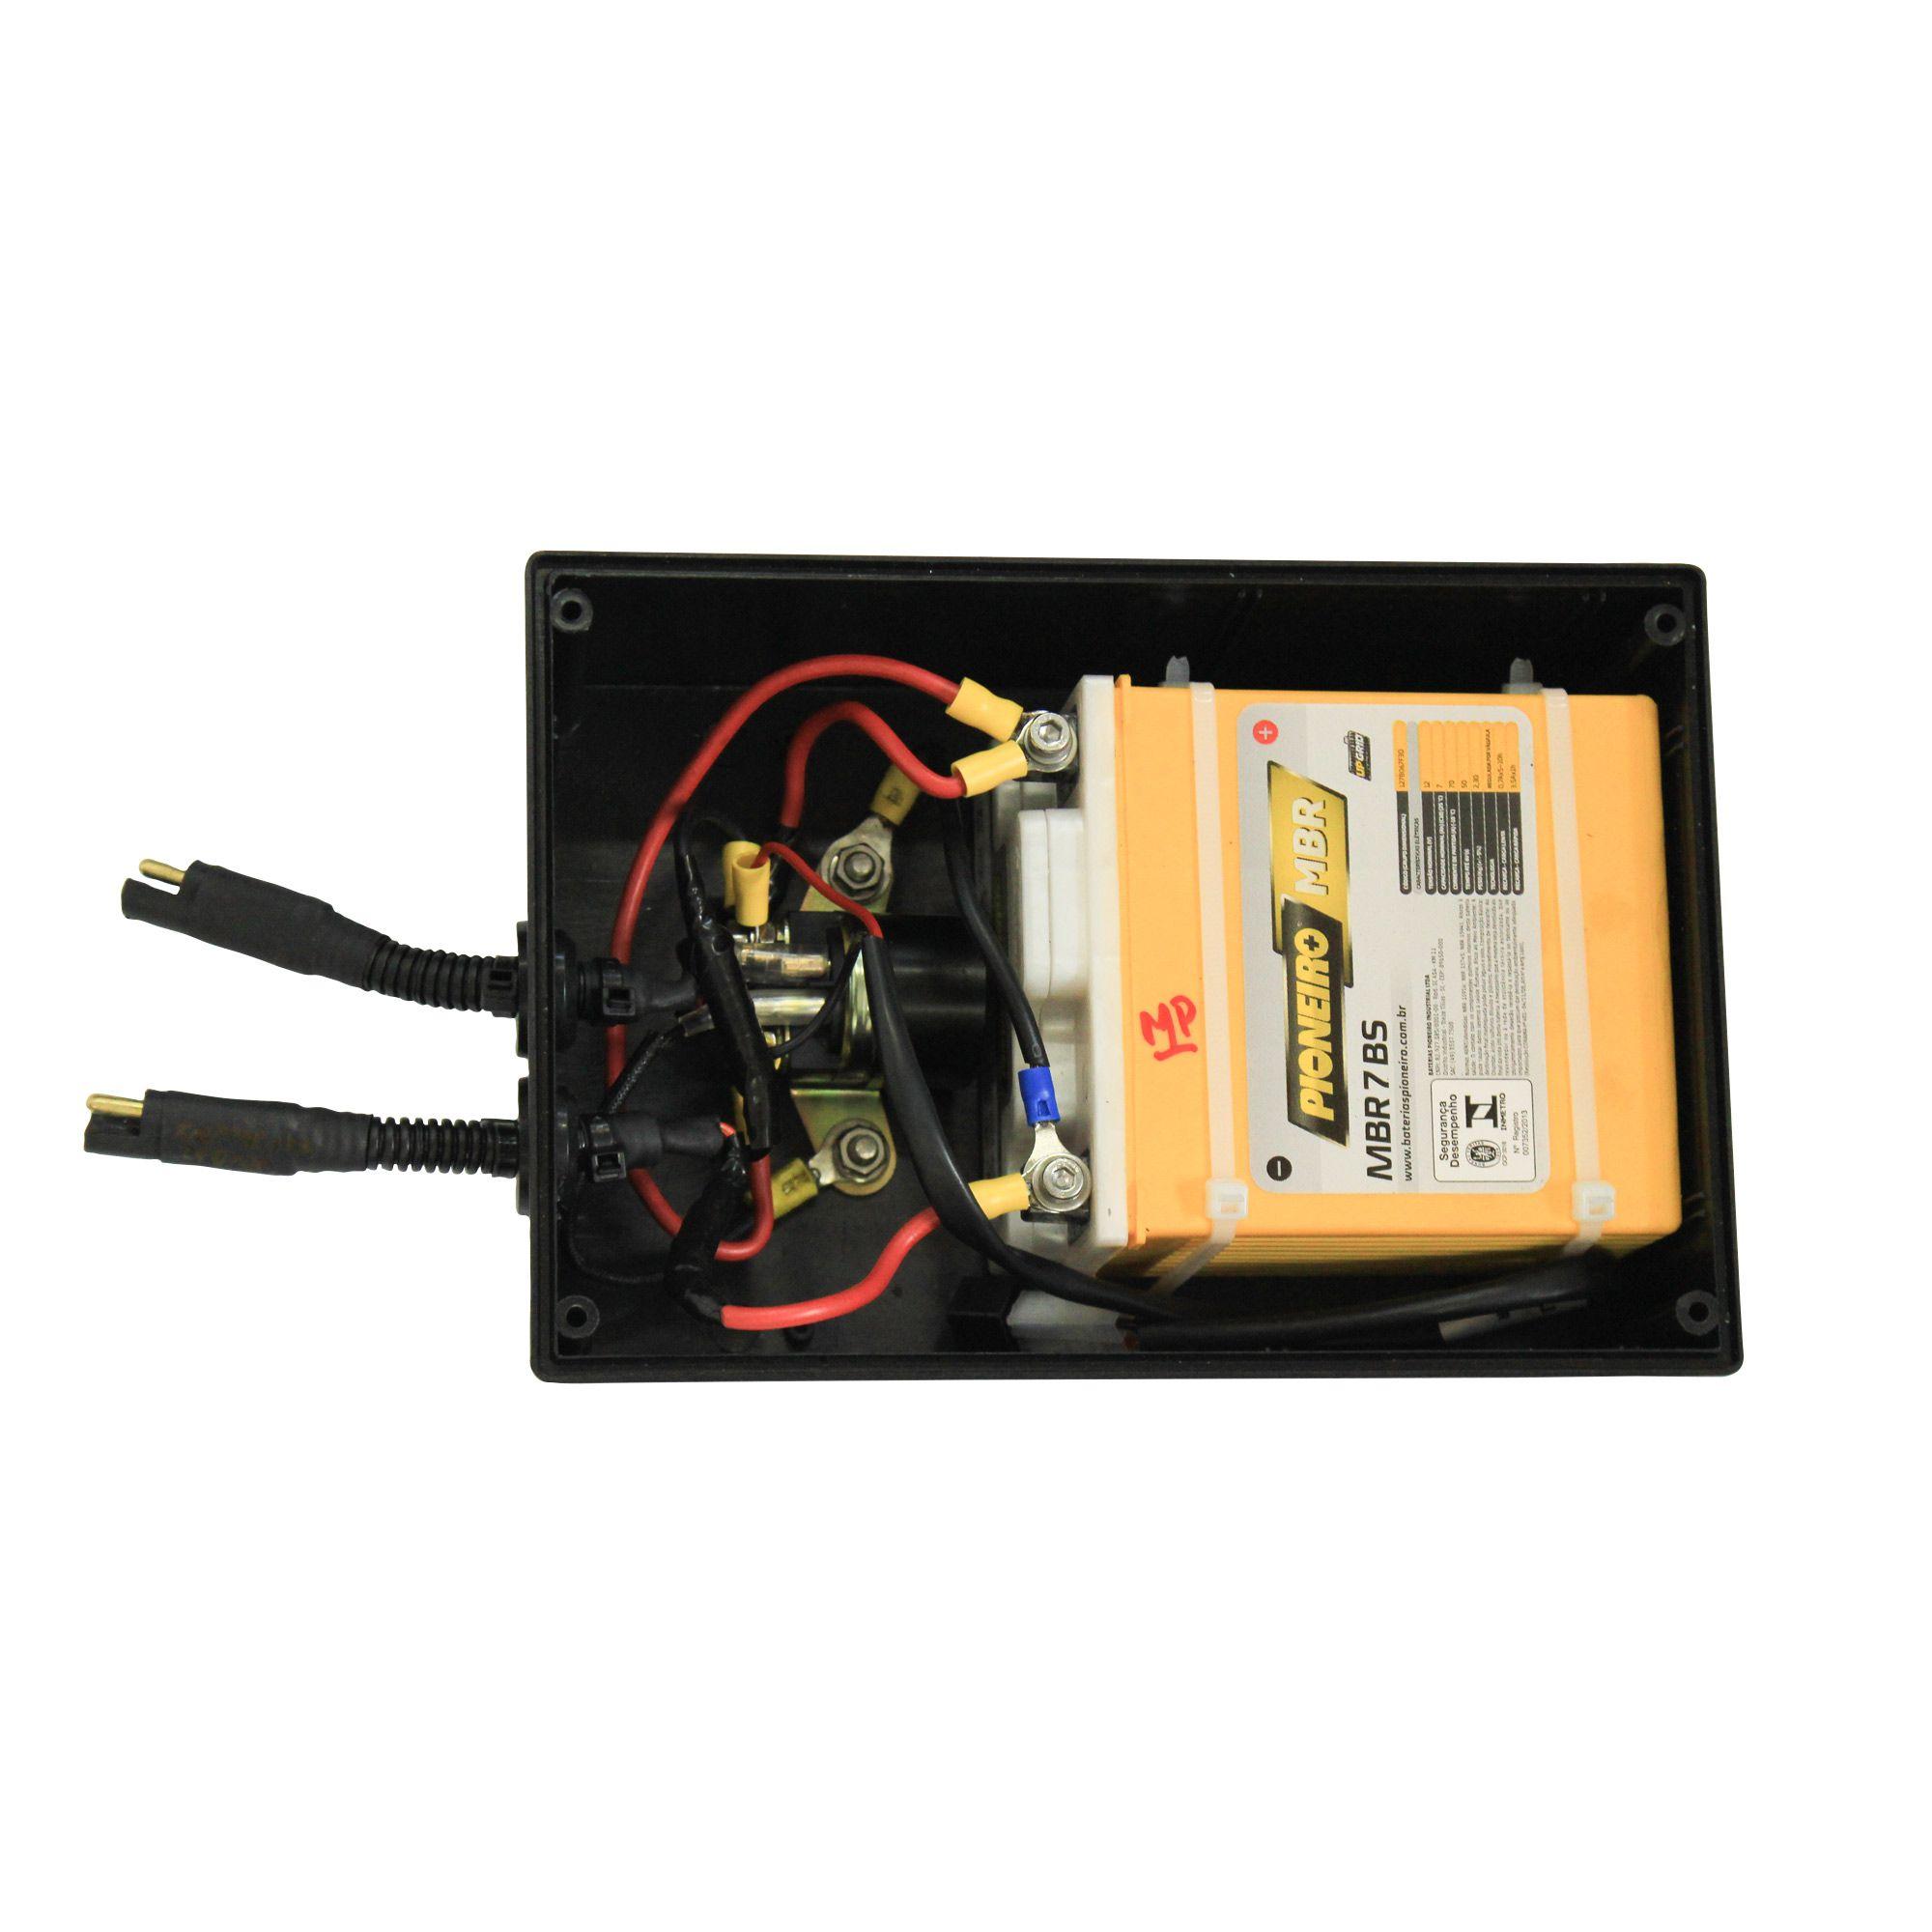 Motor Jet Turbo central com partida elétrica + suporte central